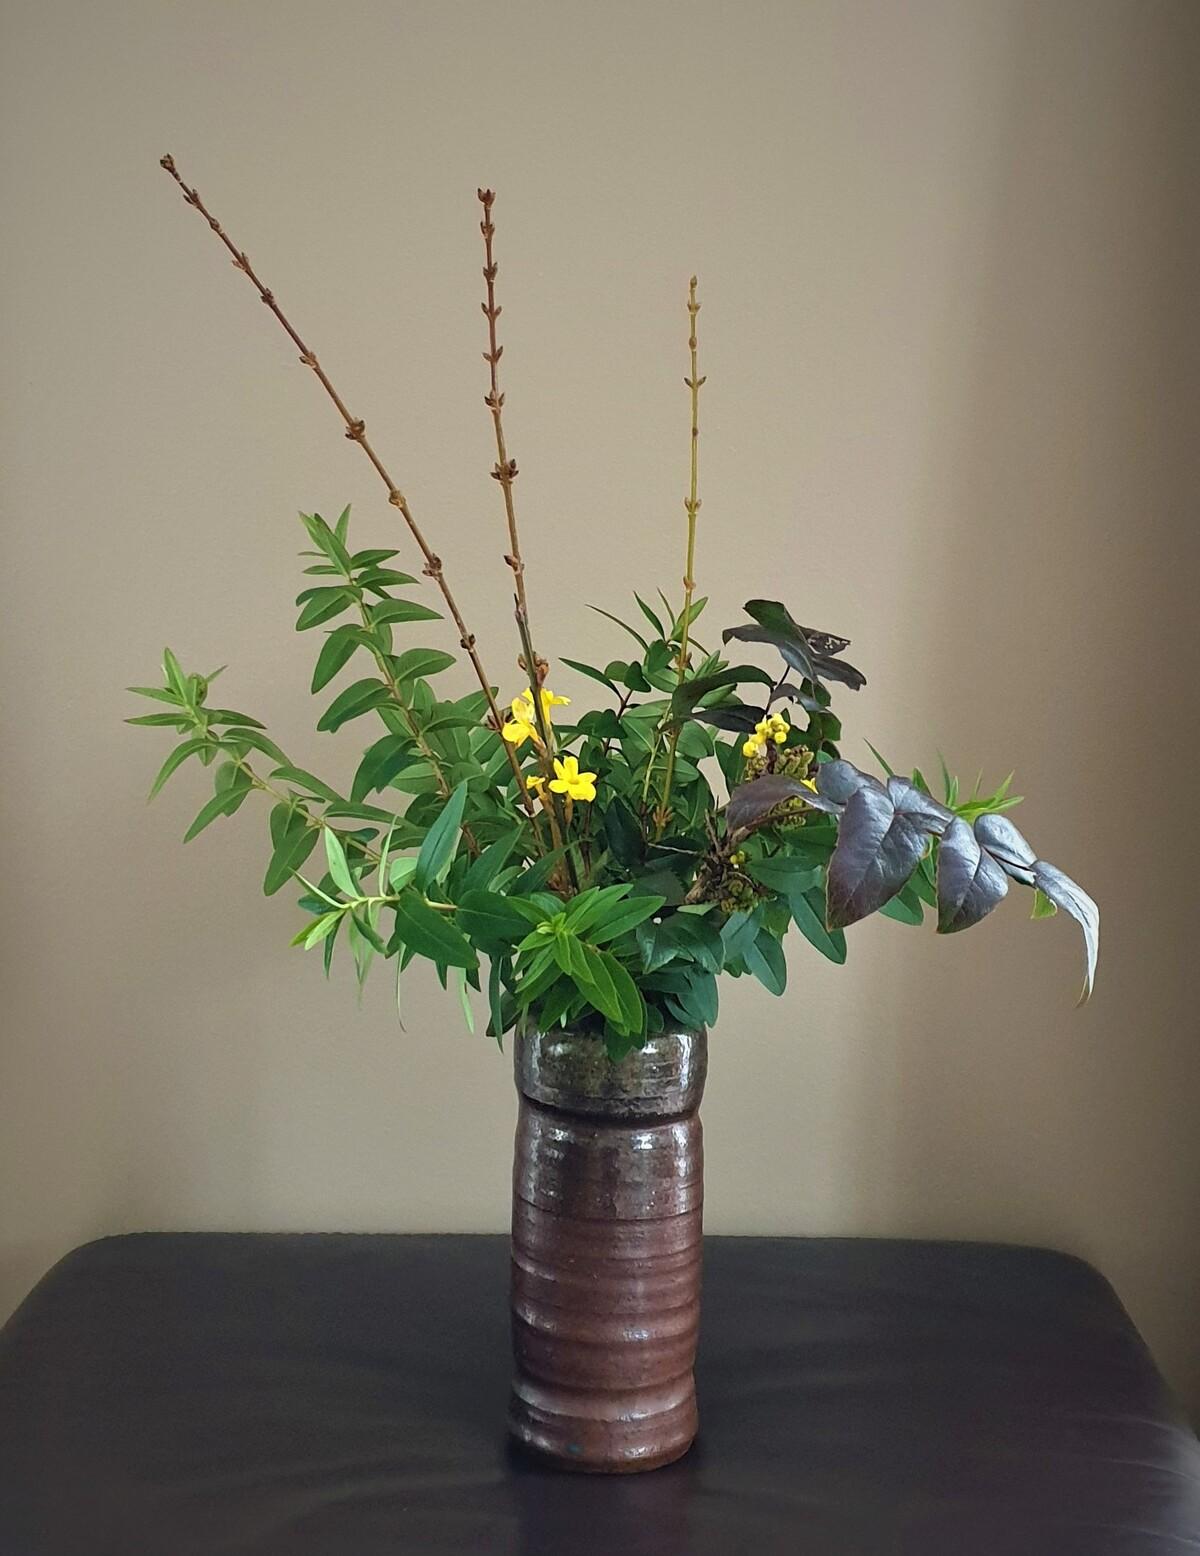 Bouquet jasmin d'hiver/ mahonia/ feuilles de millepertuis